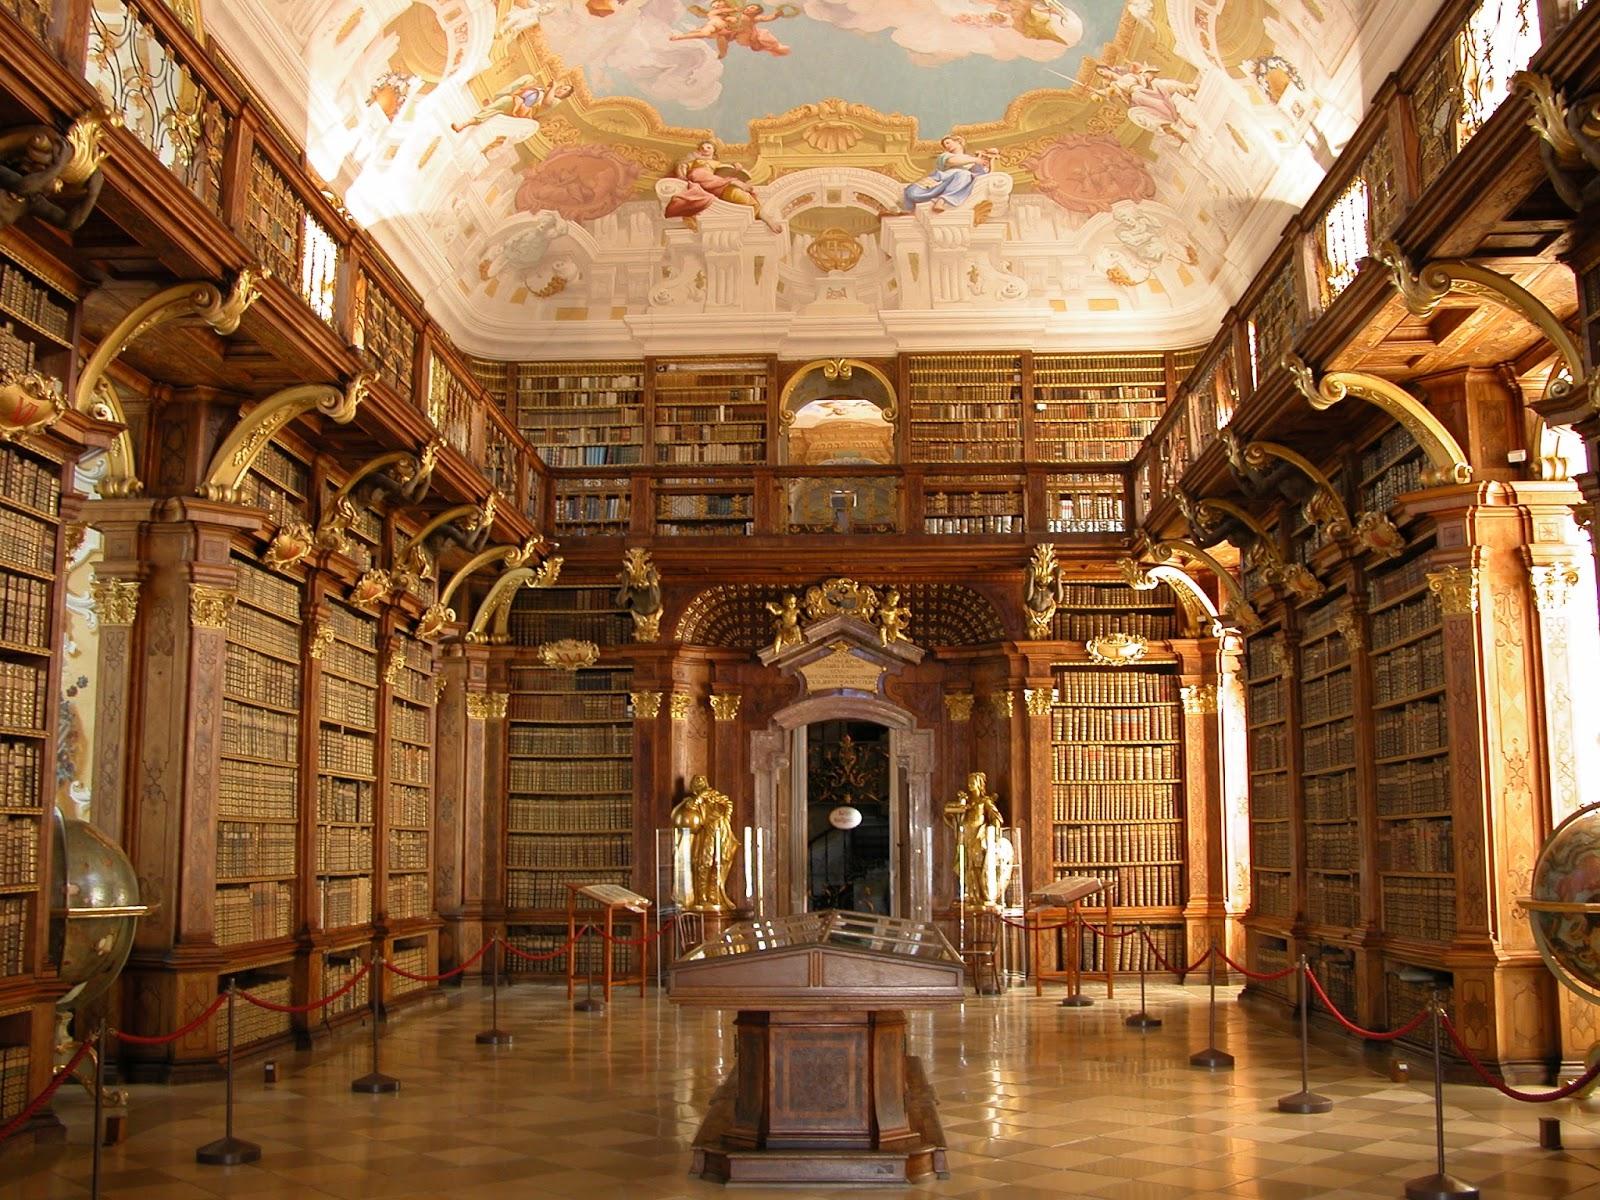 Melk_-_Abbey_-_Library.jpg